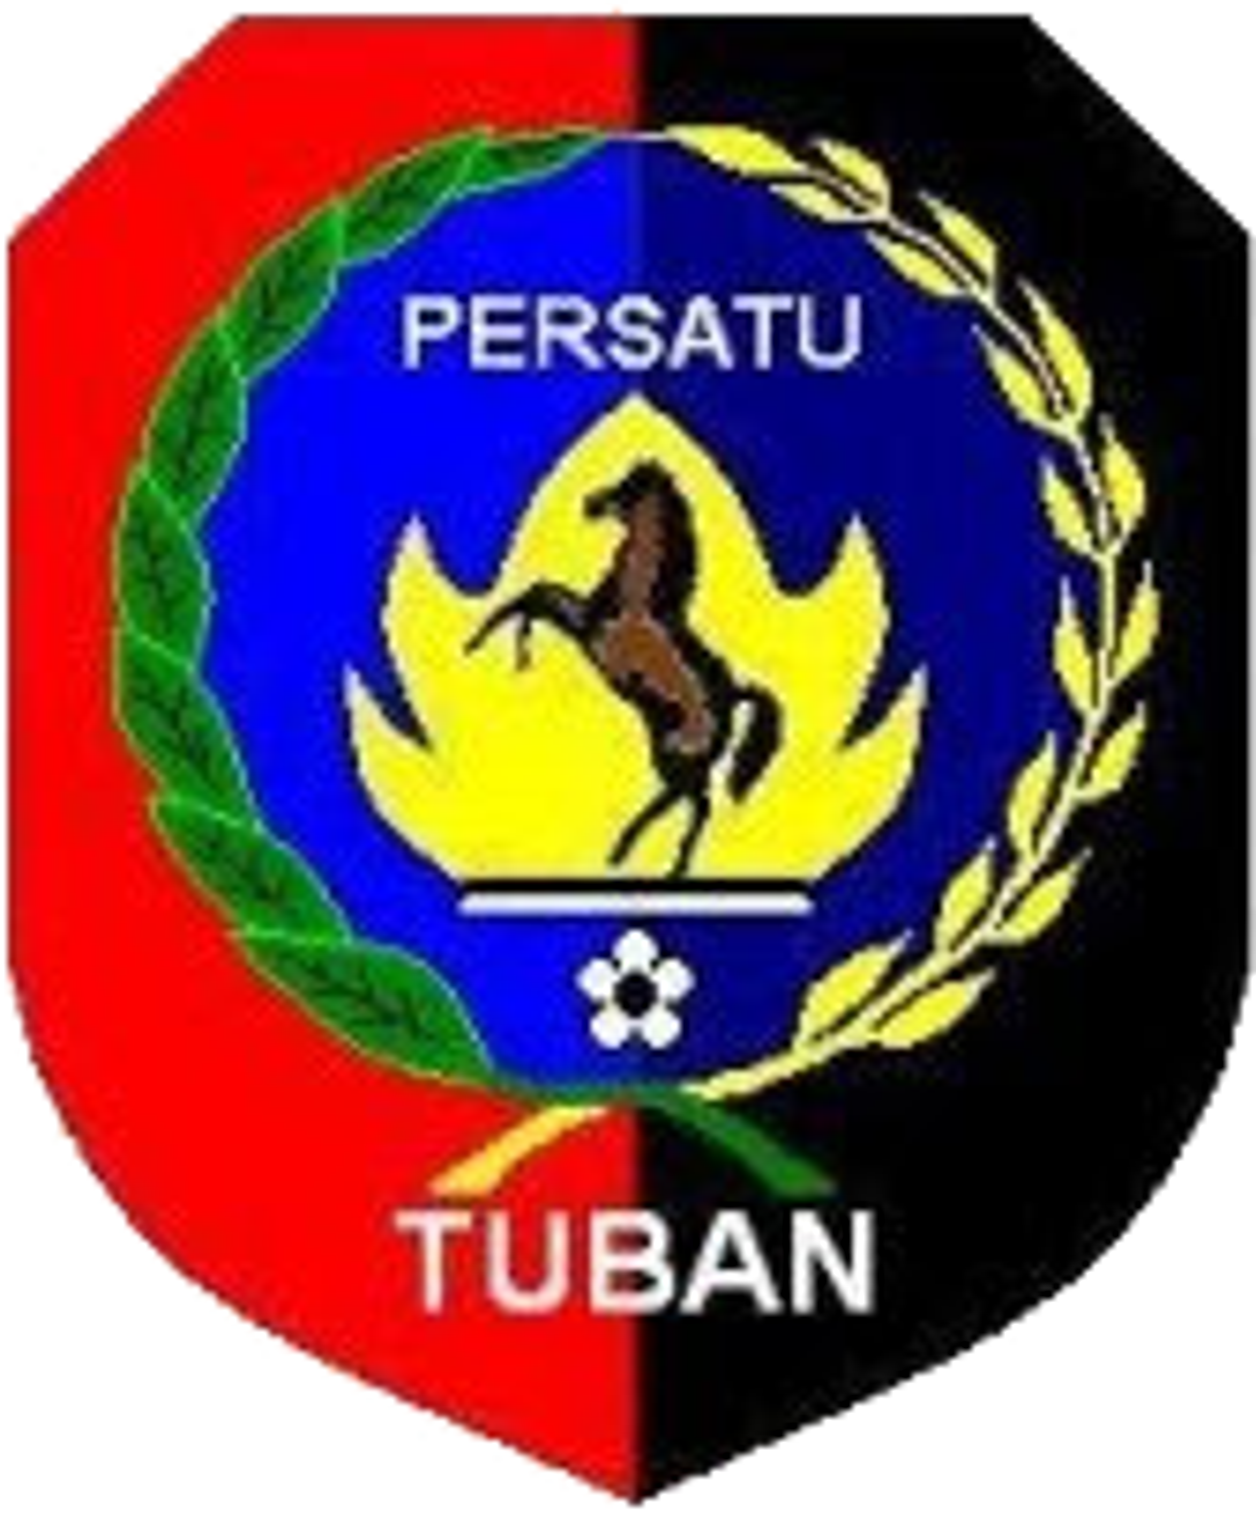 Persatu Tuban Wikipedia Bahasa Indonesia Ensiklopedia Bebas